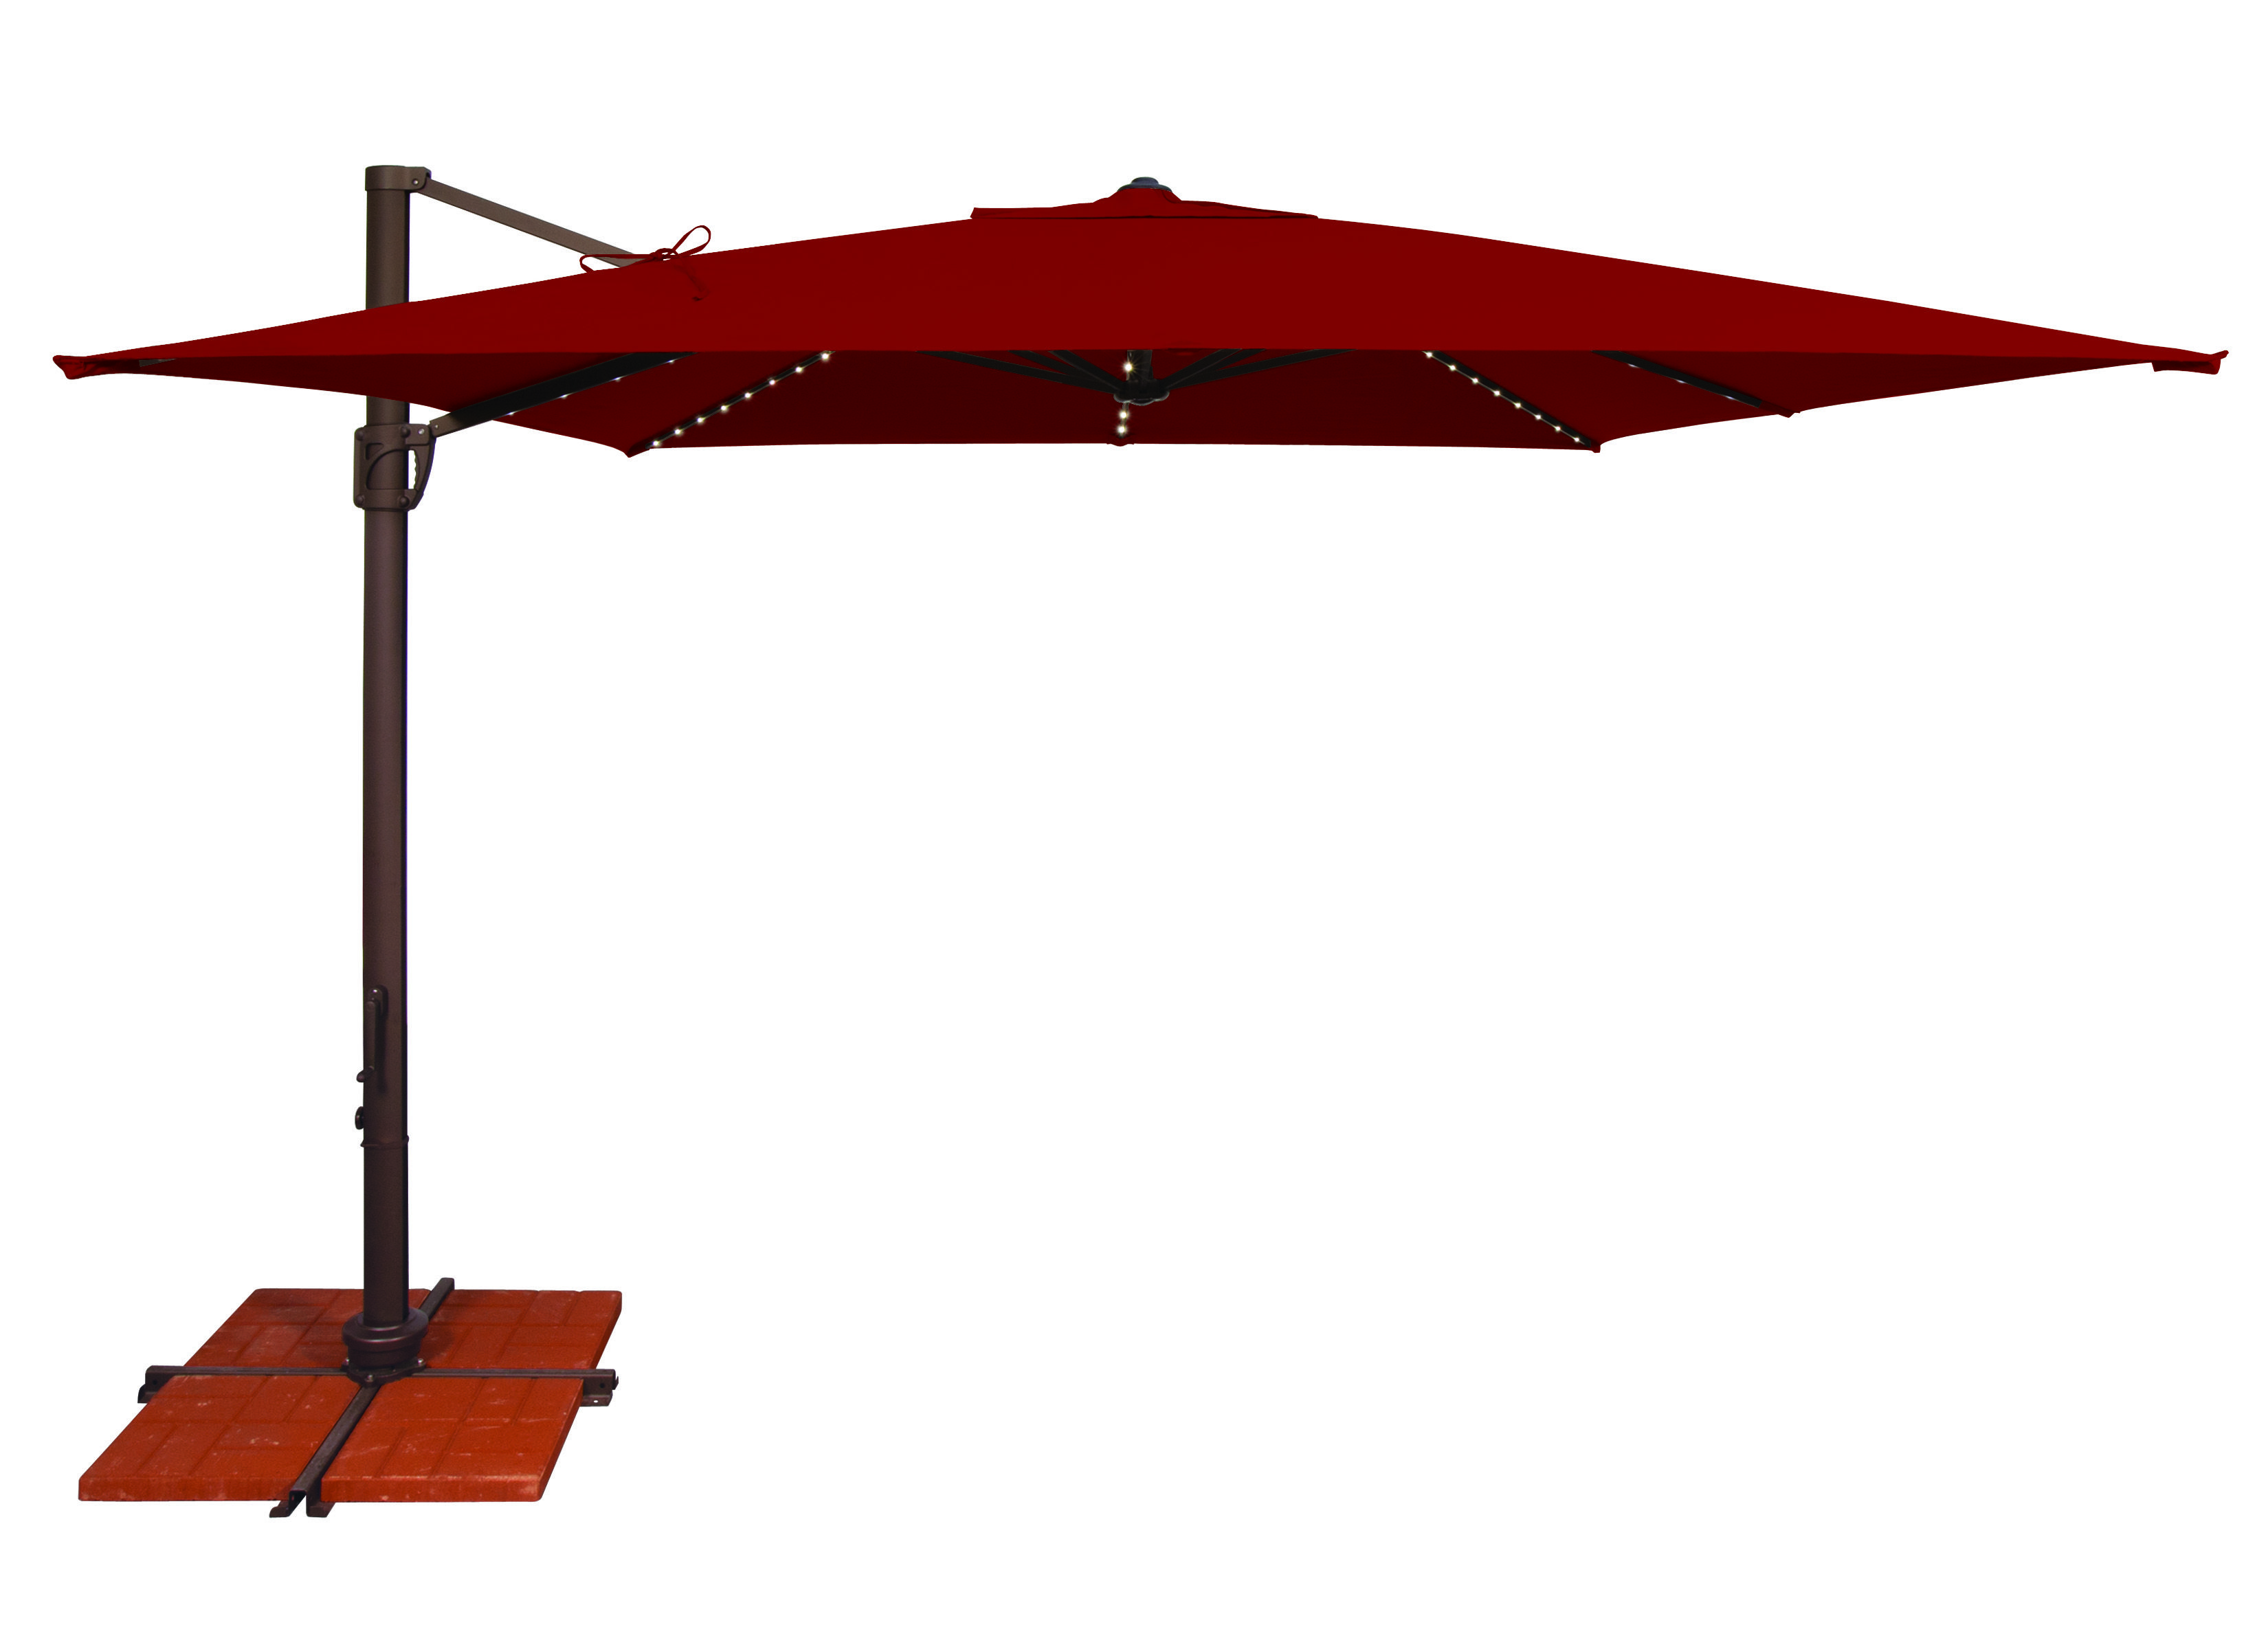 Offset Umbrellas Huge Discounts On Offset Patio Umbrellas U0026 Cantilever  Umbrella Sale At FactoryDirectPatioUmbrellas.com